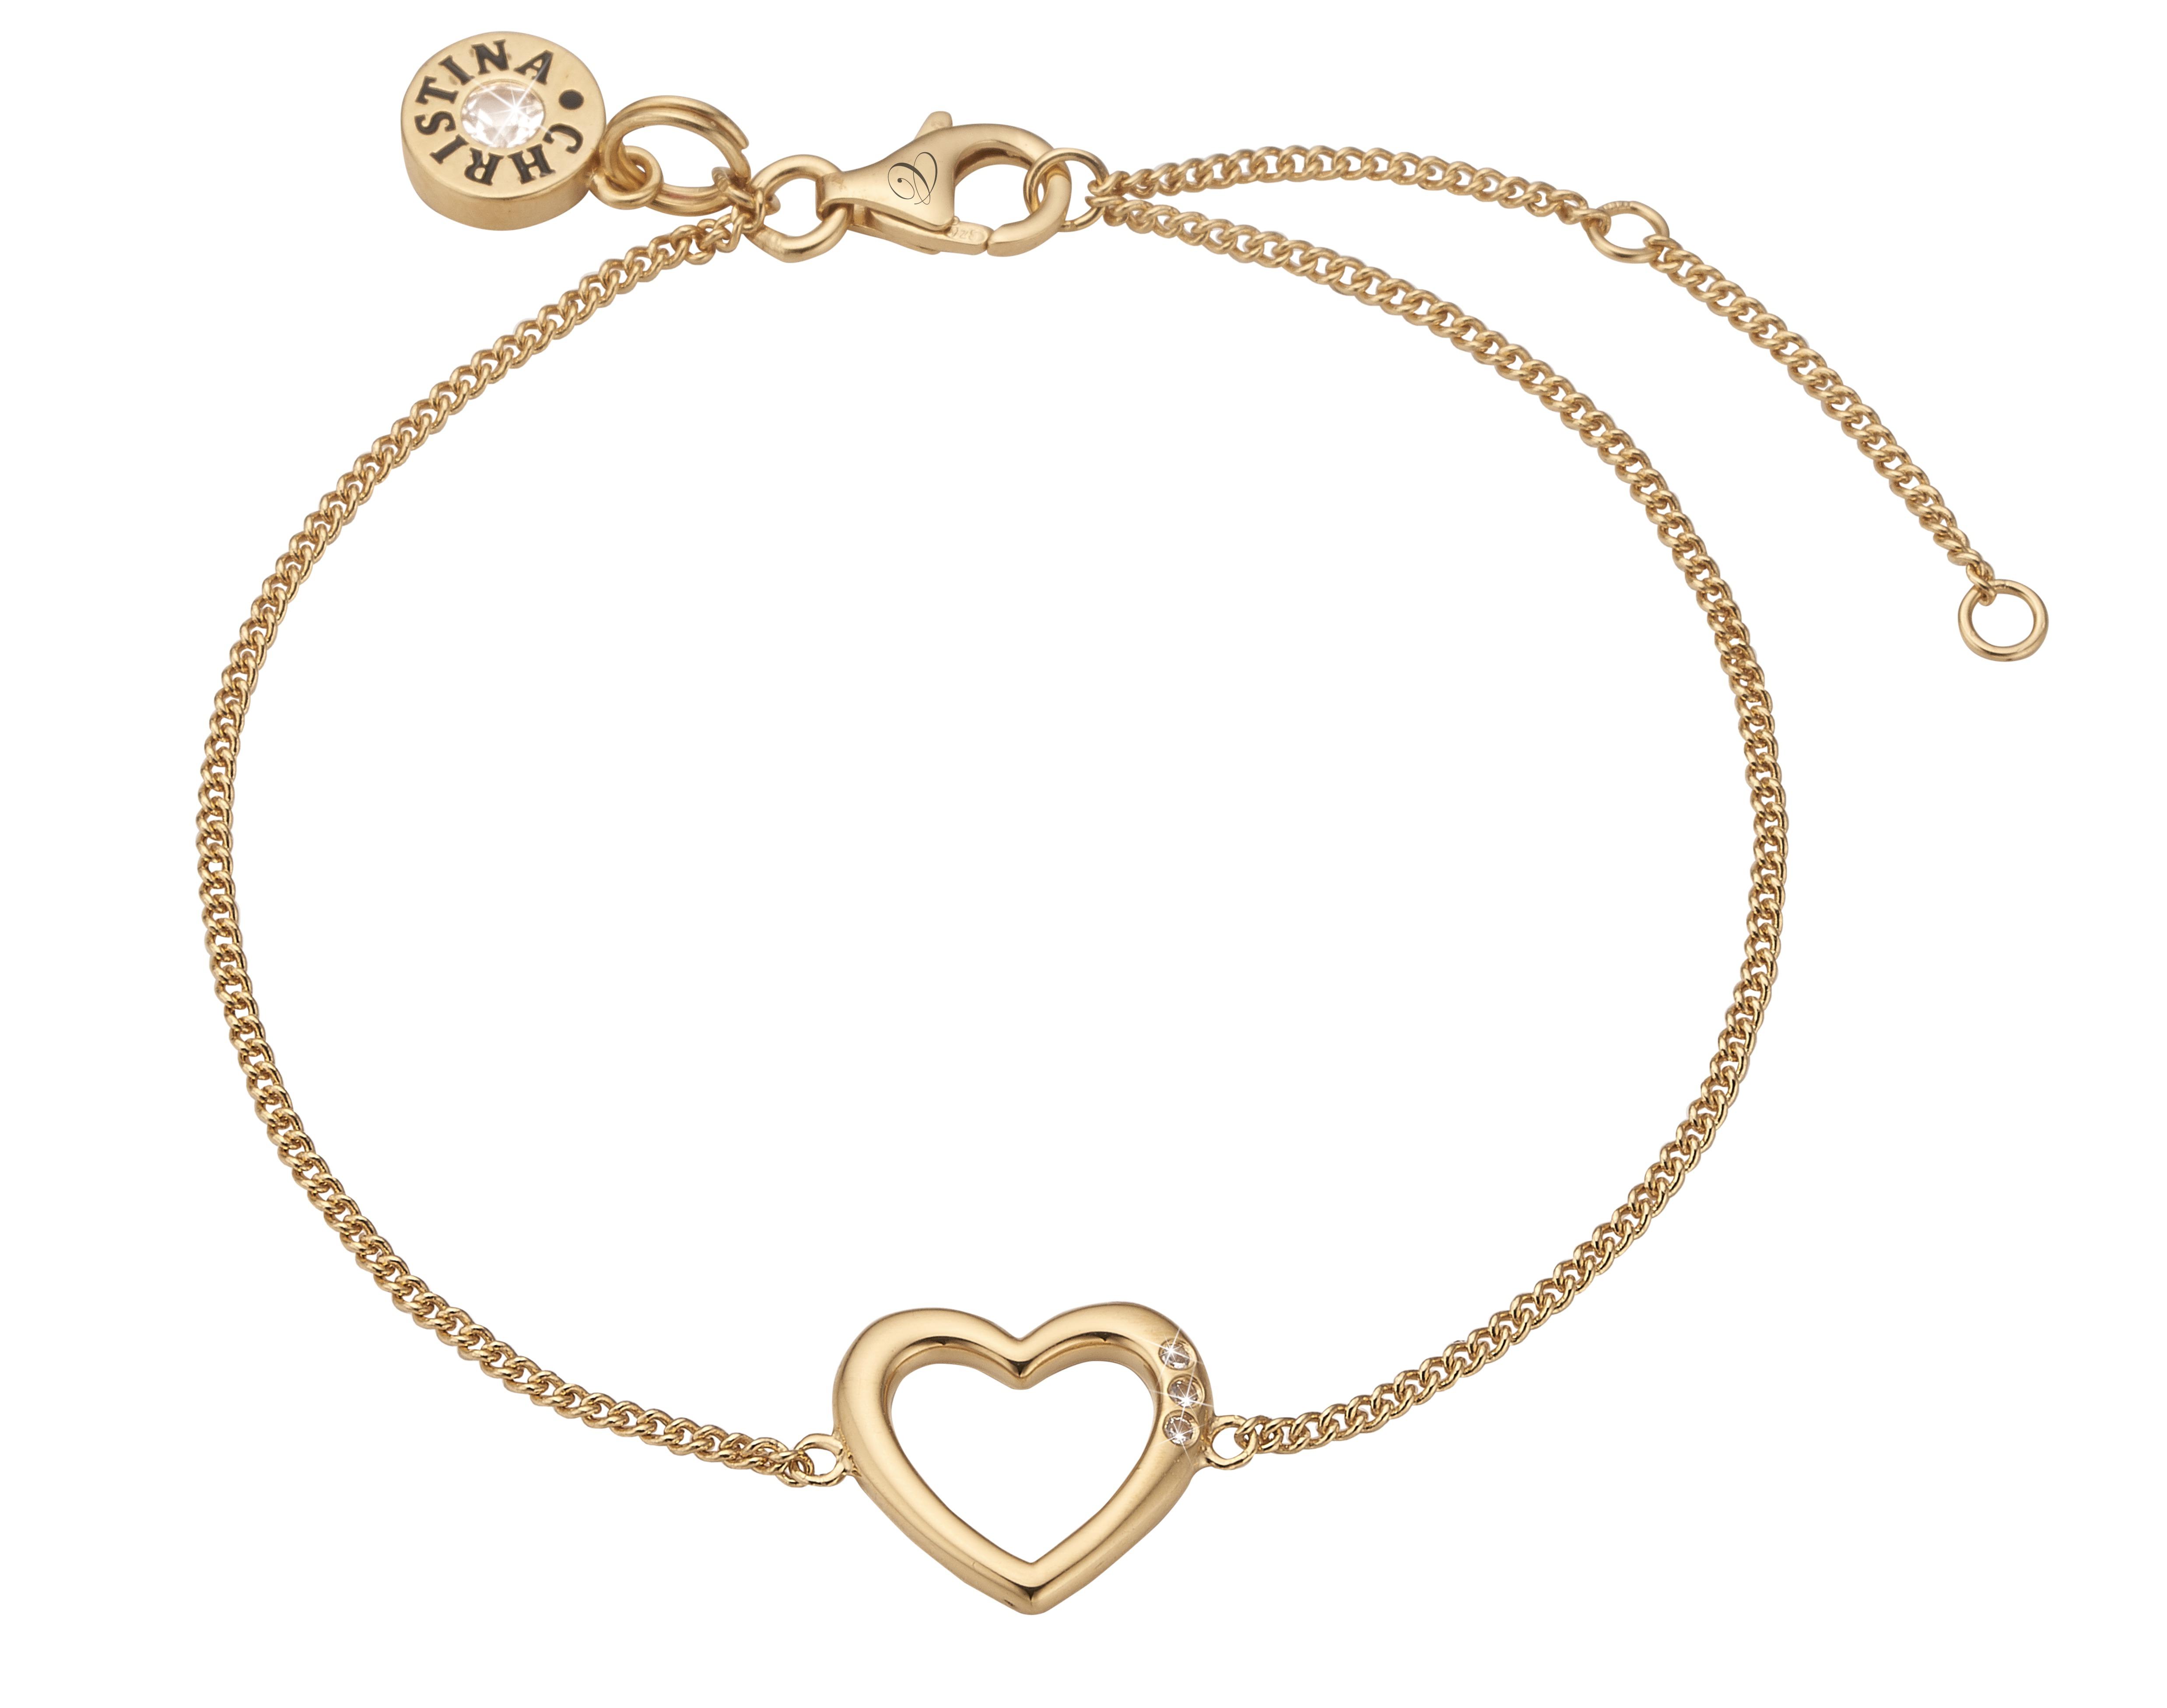 Image of Christina open heart forgyldt armbånd - 601-G10 20 centimeter